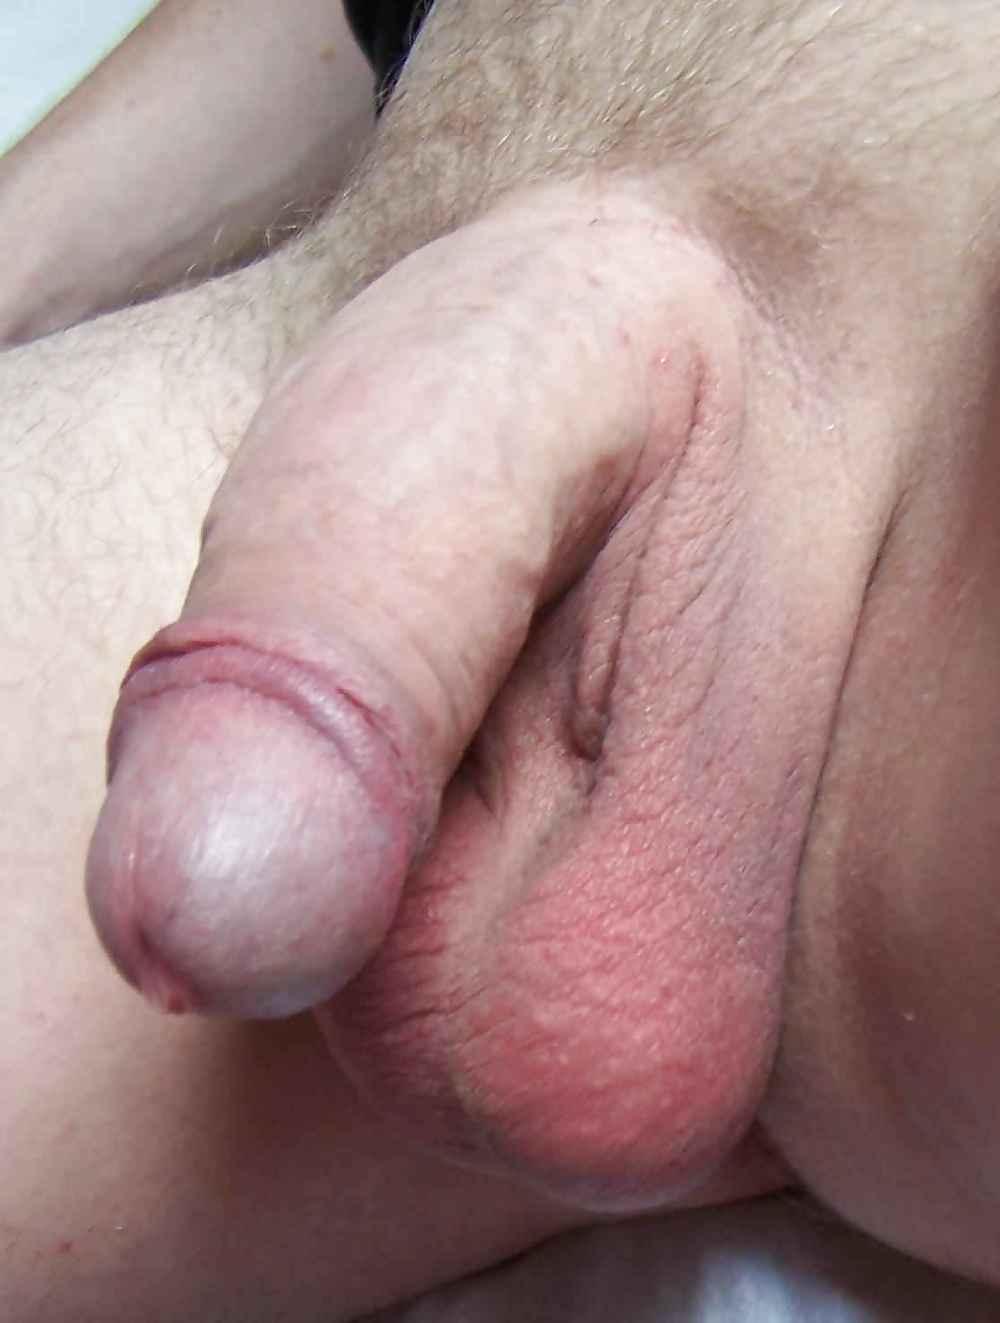 Seppel